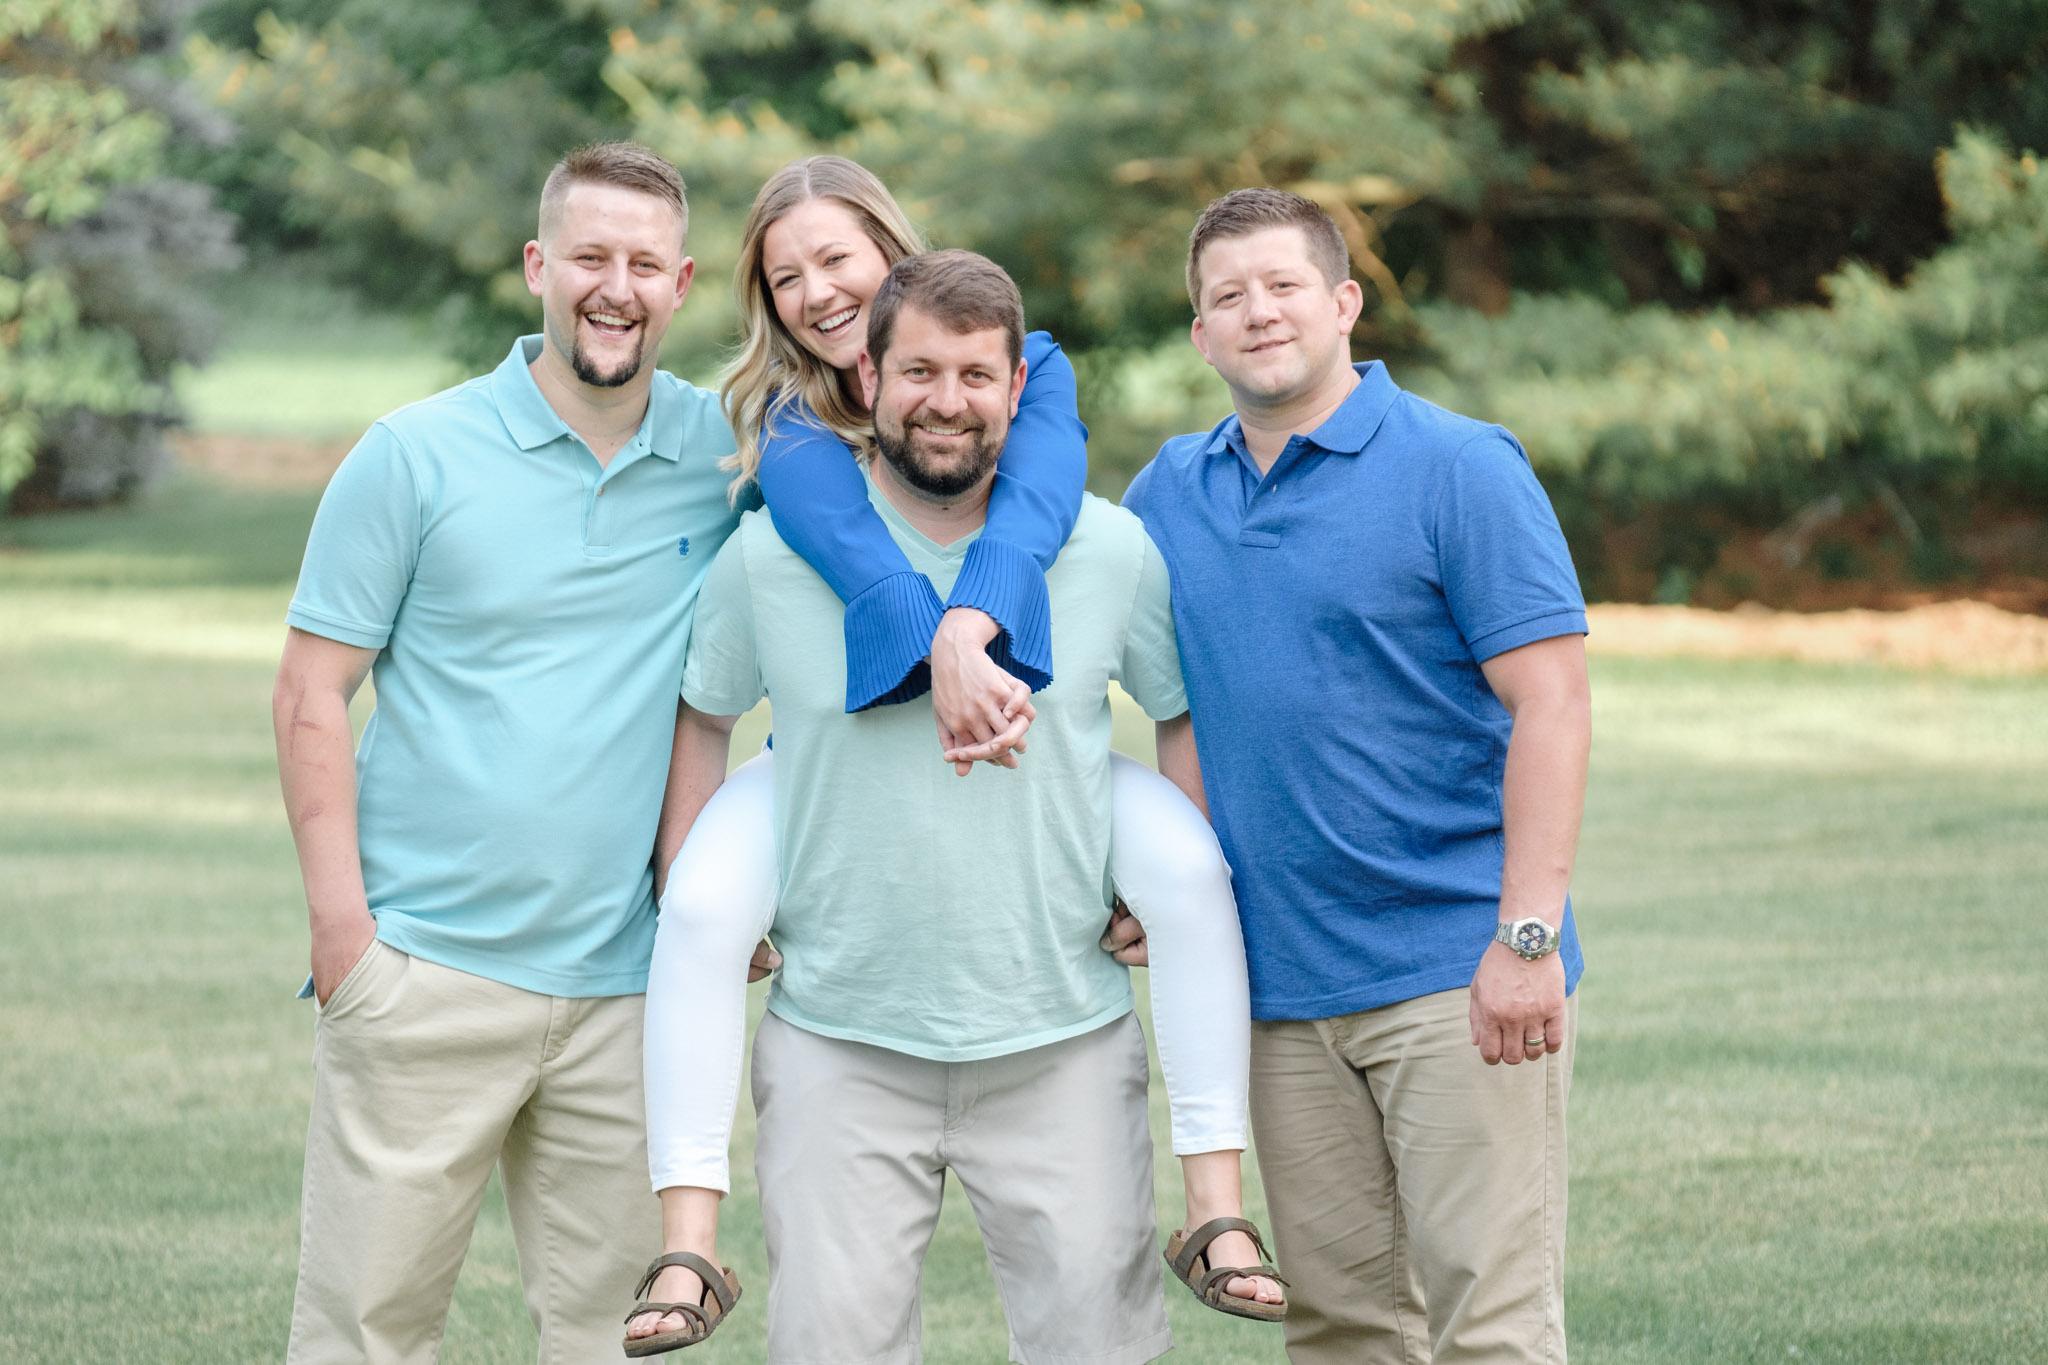 2018 BAP Vandiver Family Photos Roscoe-2.jpg